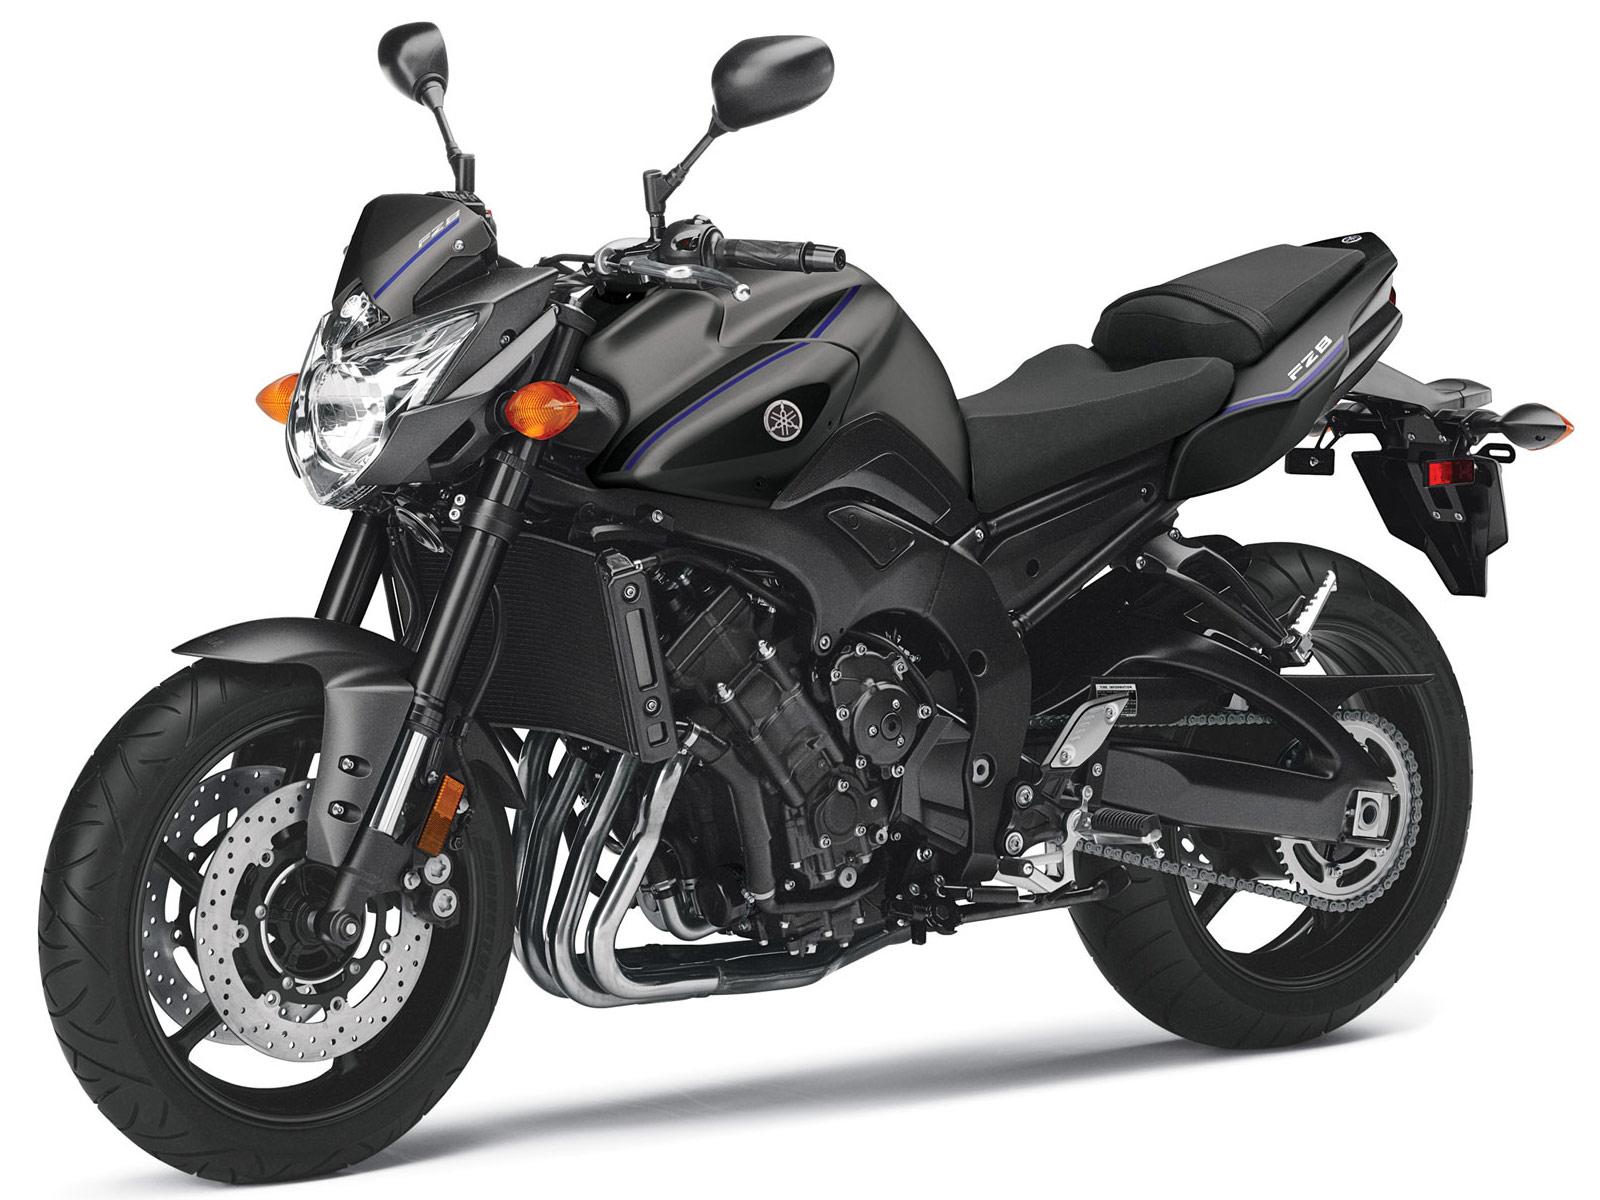 Yamaha fz8 deals